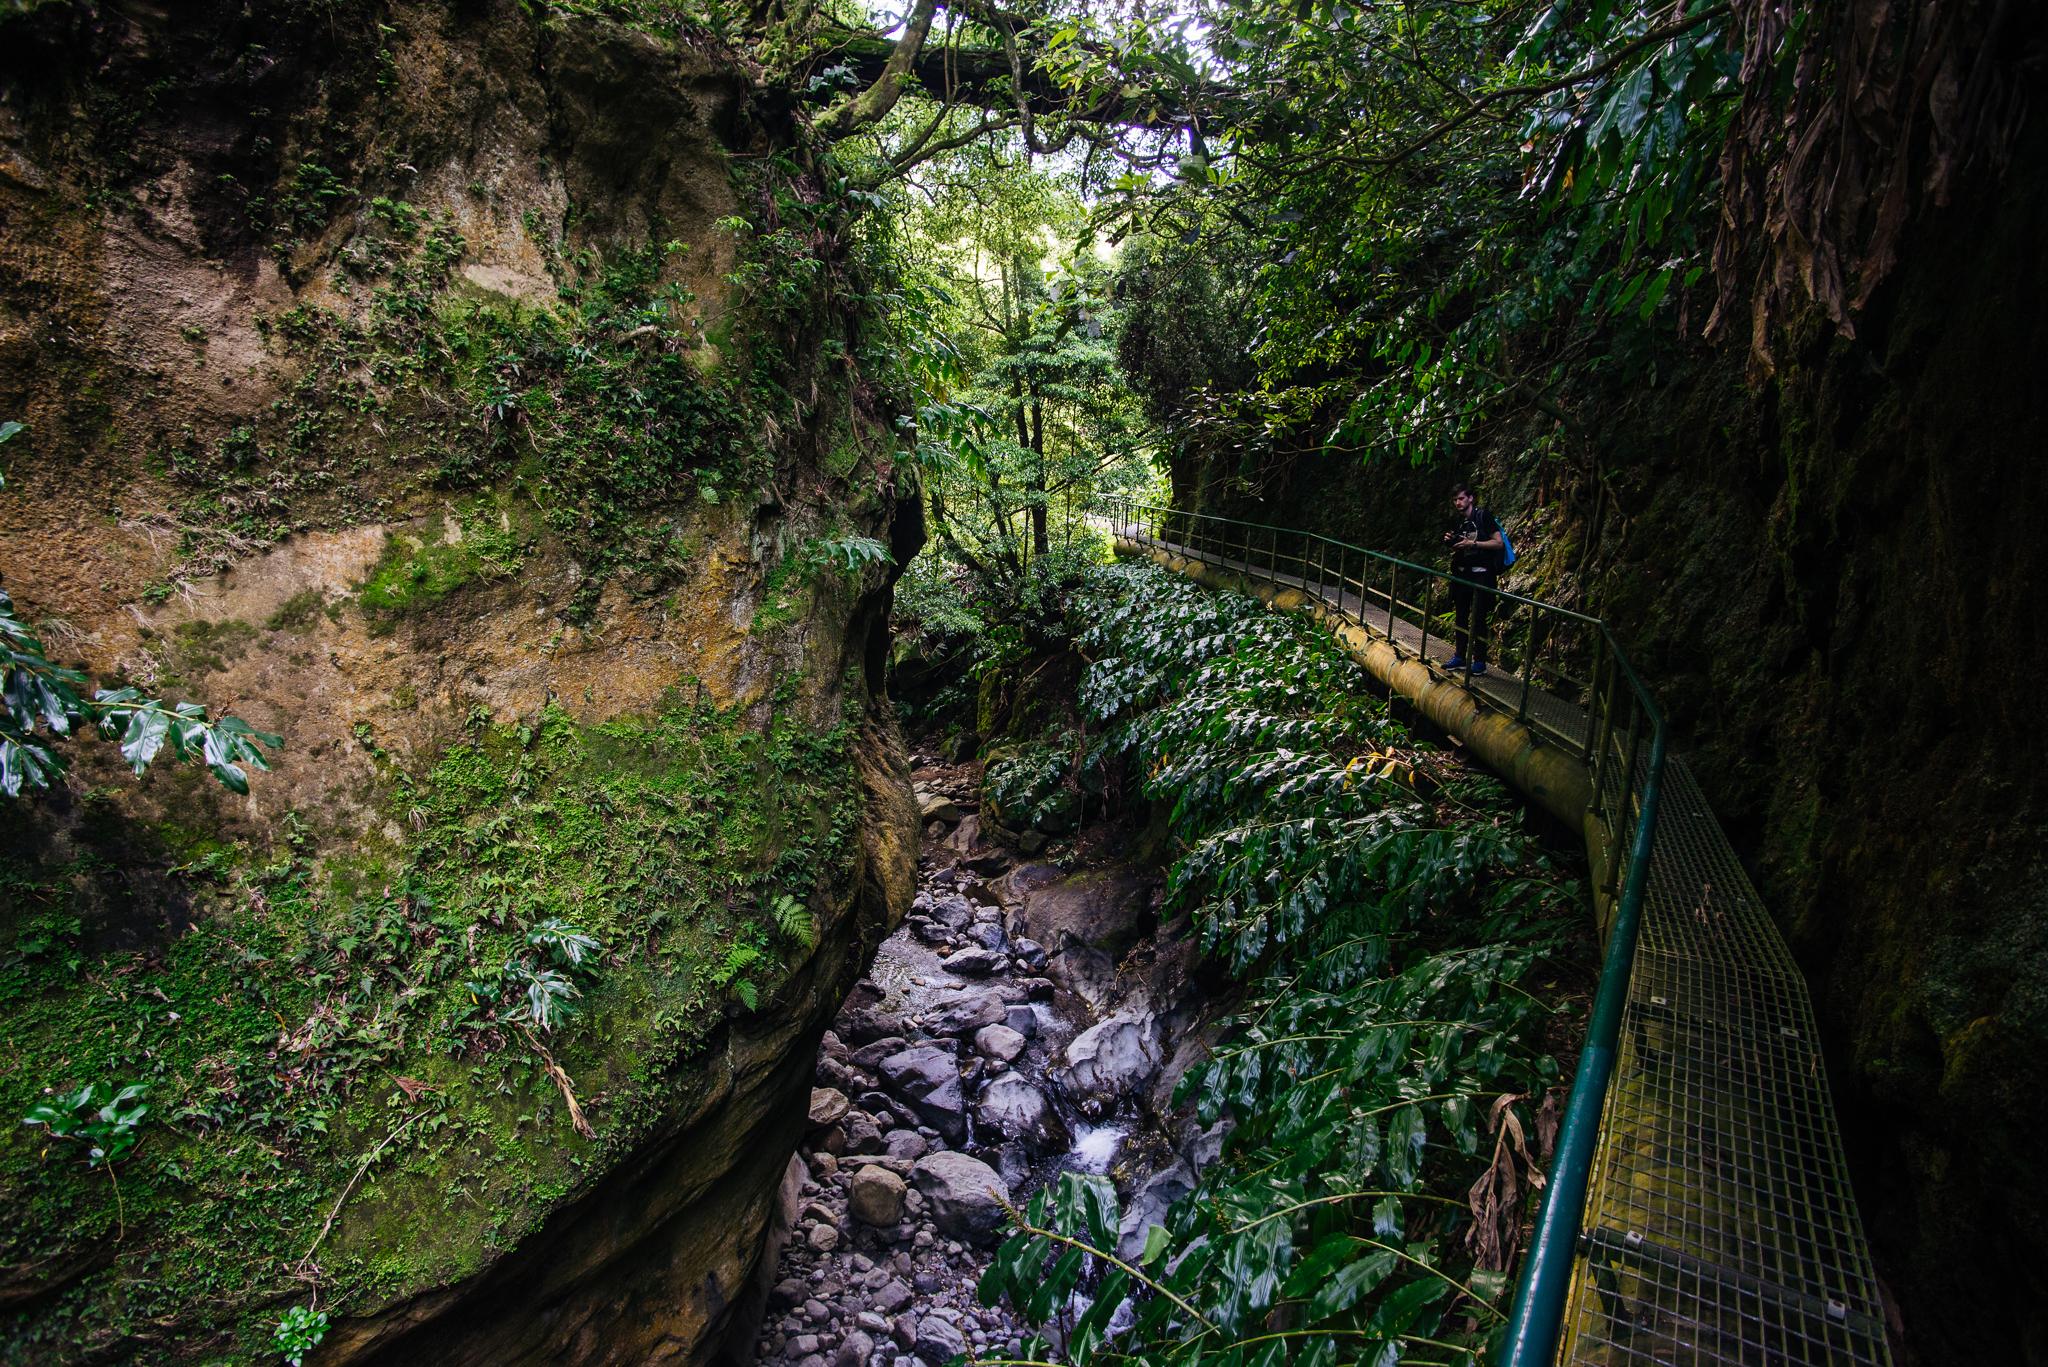 Salto do Cabrito túraúvtonal az Azori-szigeteken.